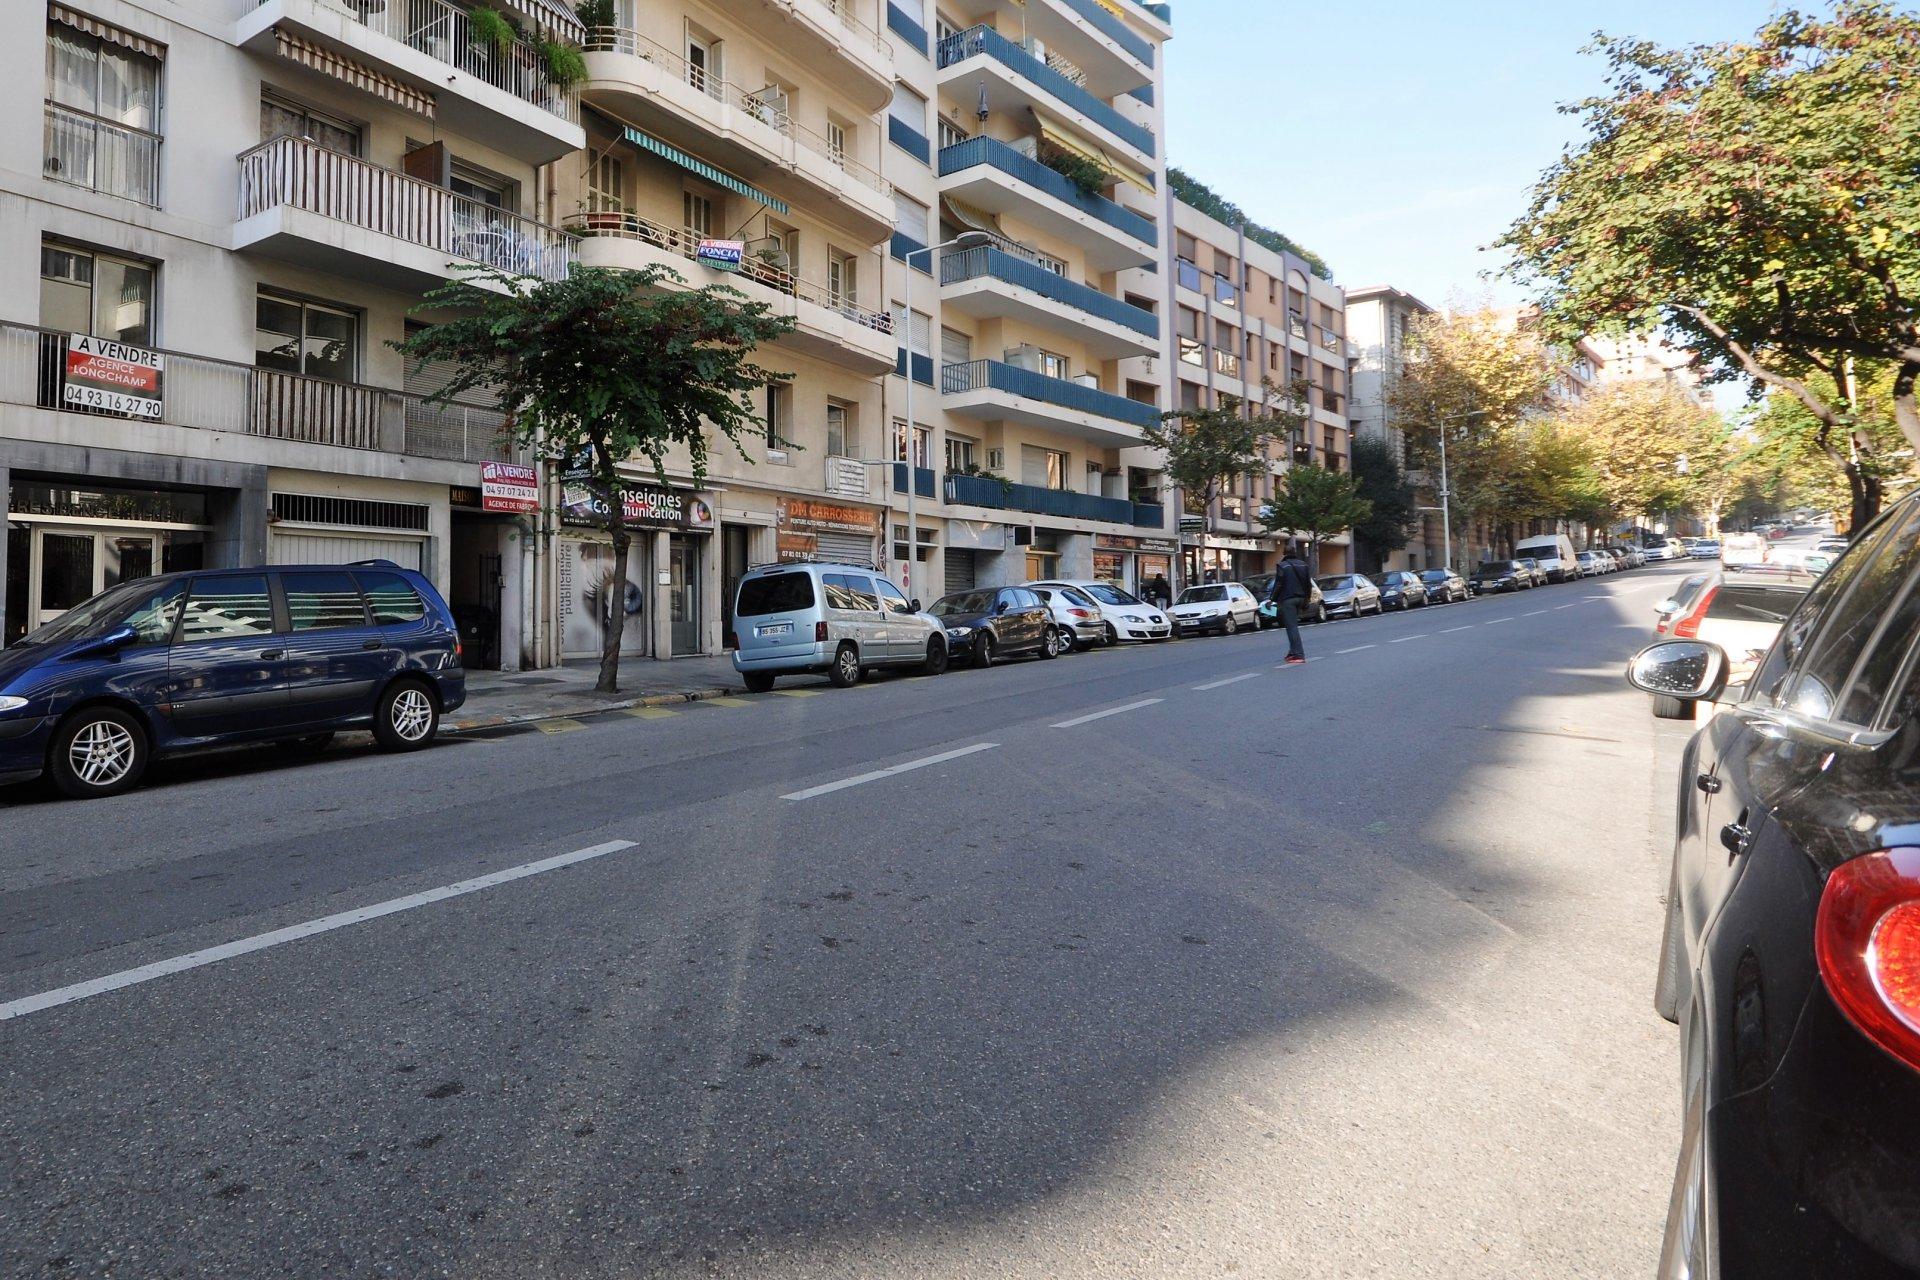 Garage vendre nice boulevard fran ois grosso for Taxe fonciere garage prix